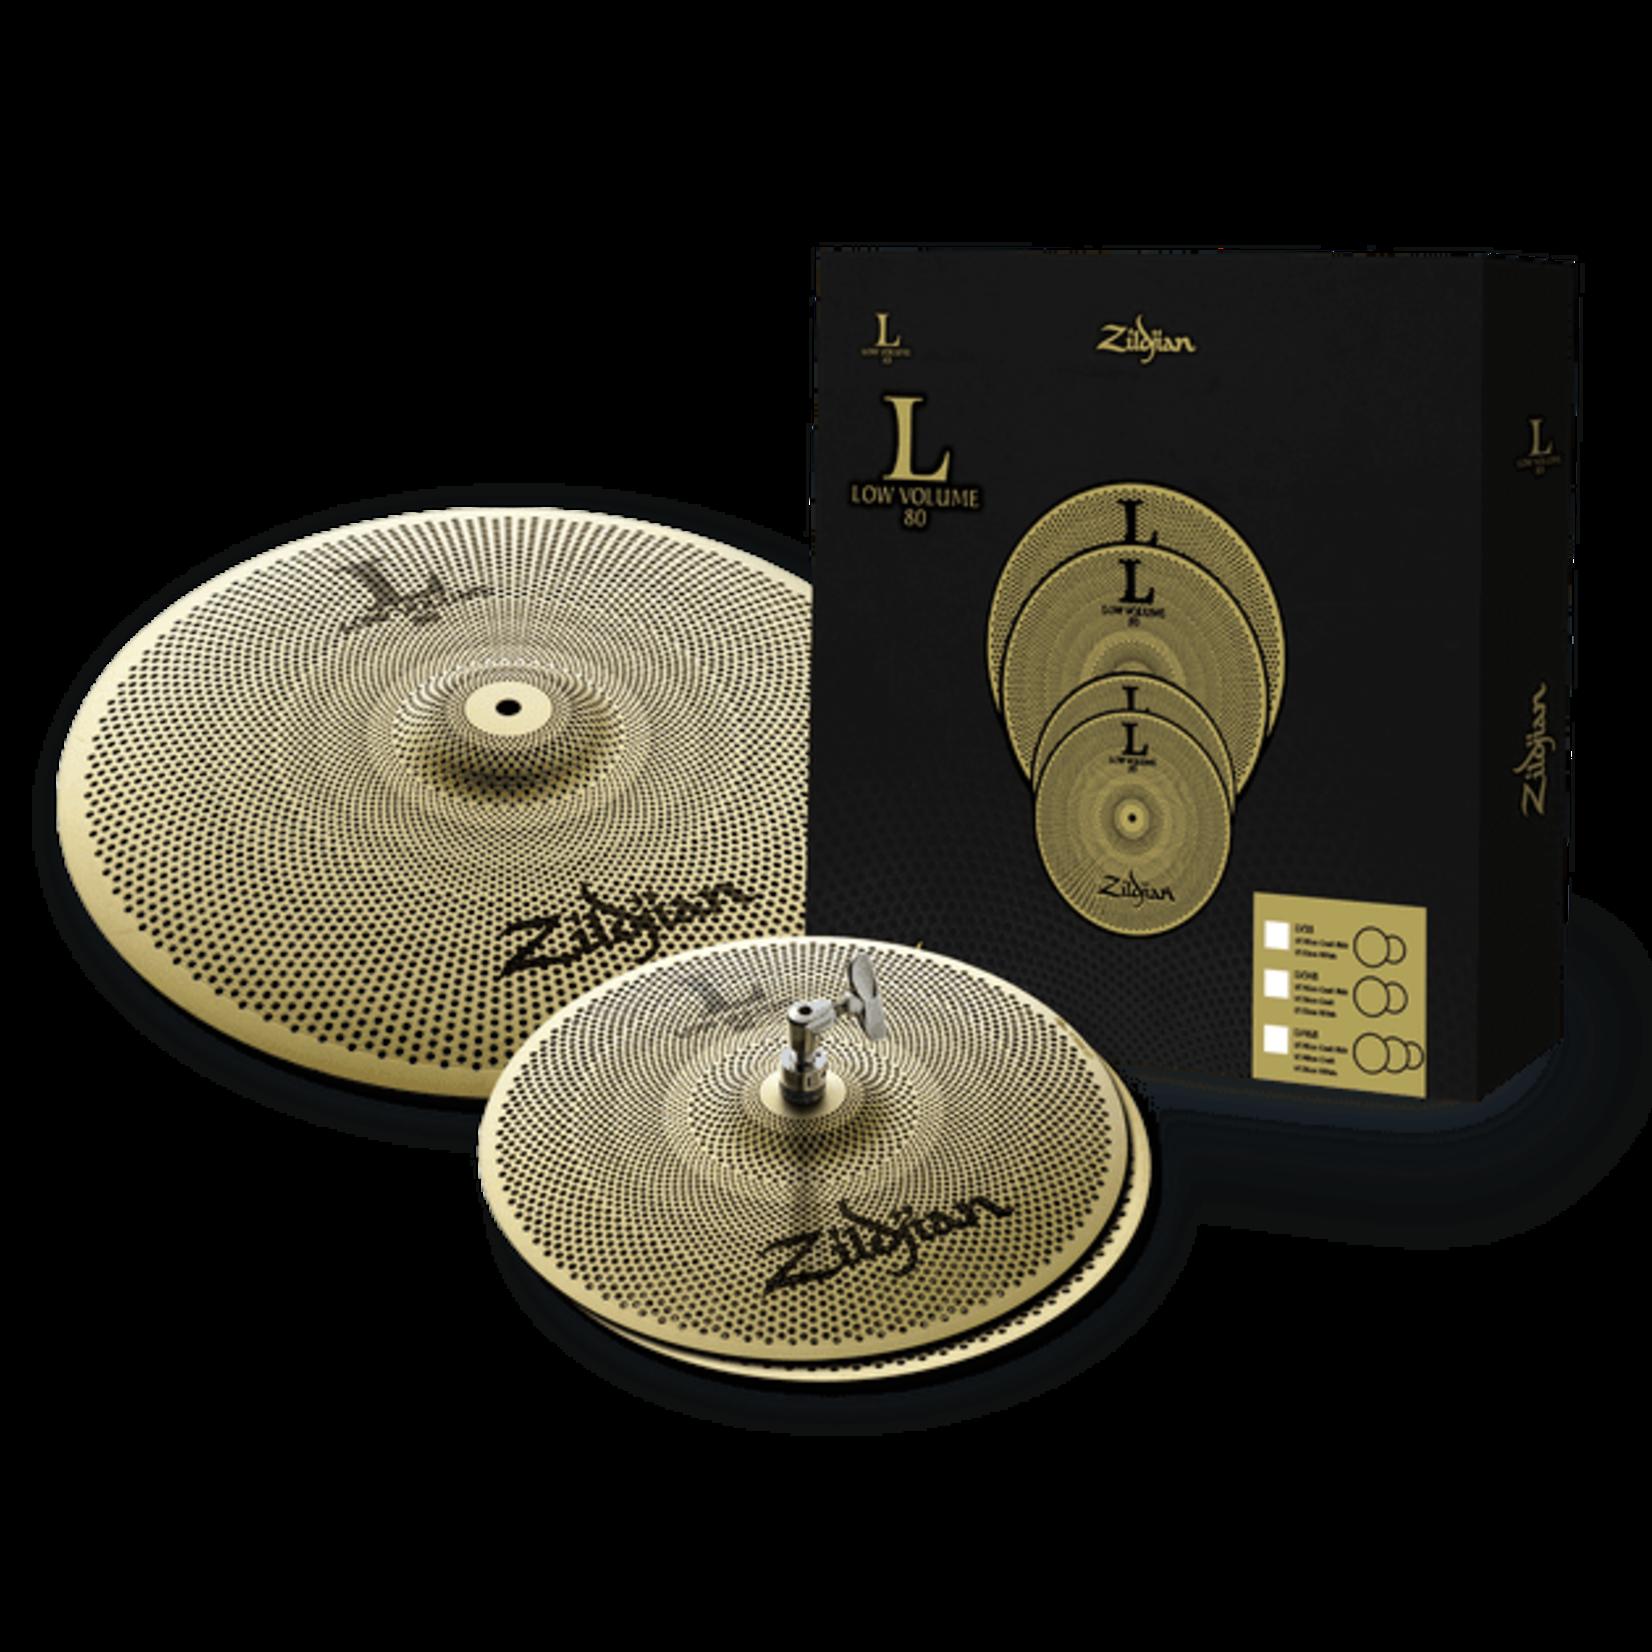 Zildjian Zildjian L80 Low Volume Cymbal Pack - LV38